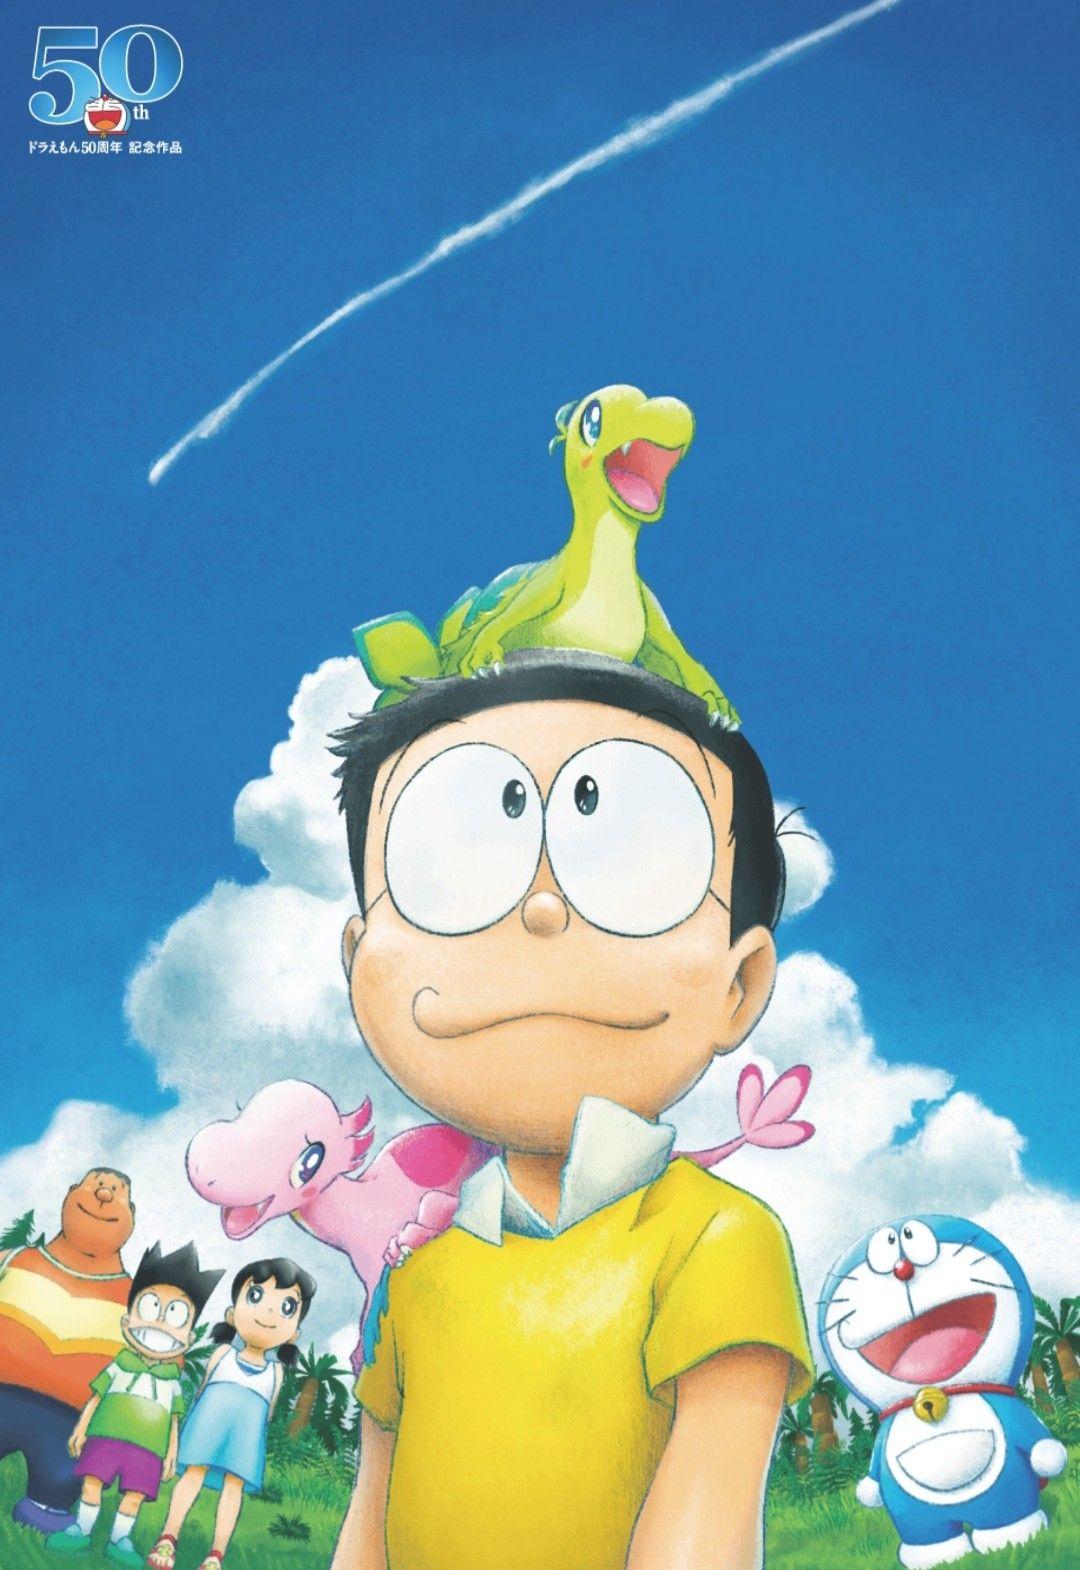 doraemon movie おしゃれまとめの人気アイデア pinterest yasironene アニメチビ ドラえもん 恐竜